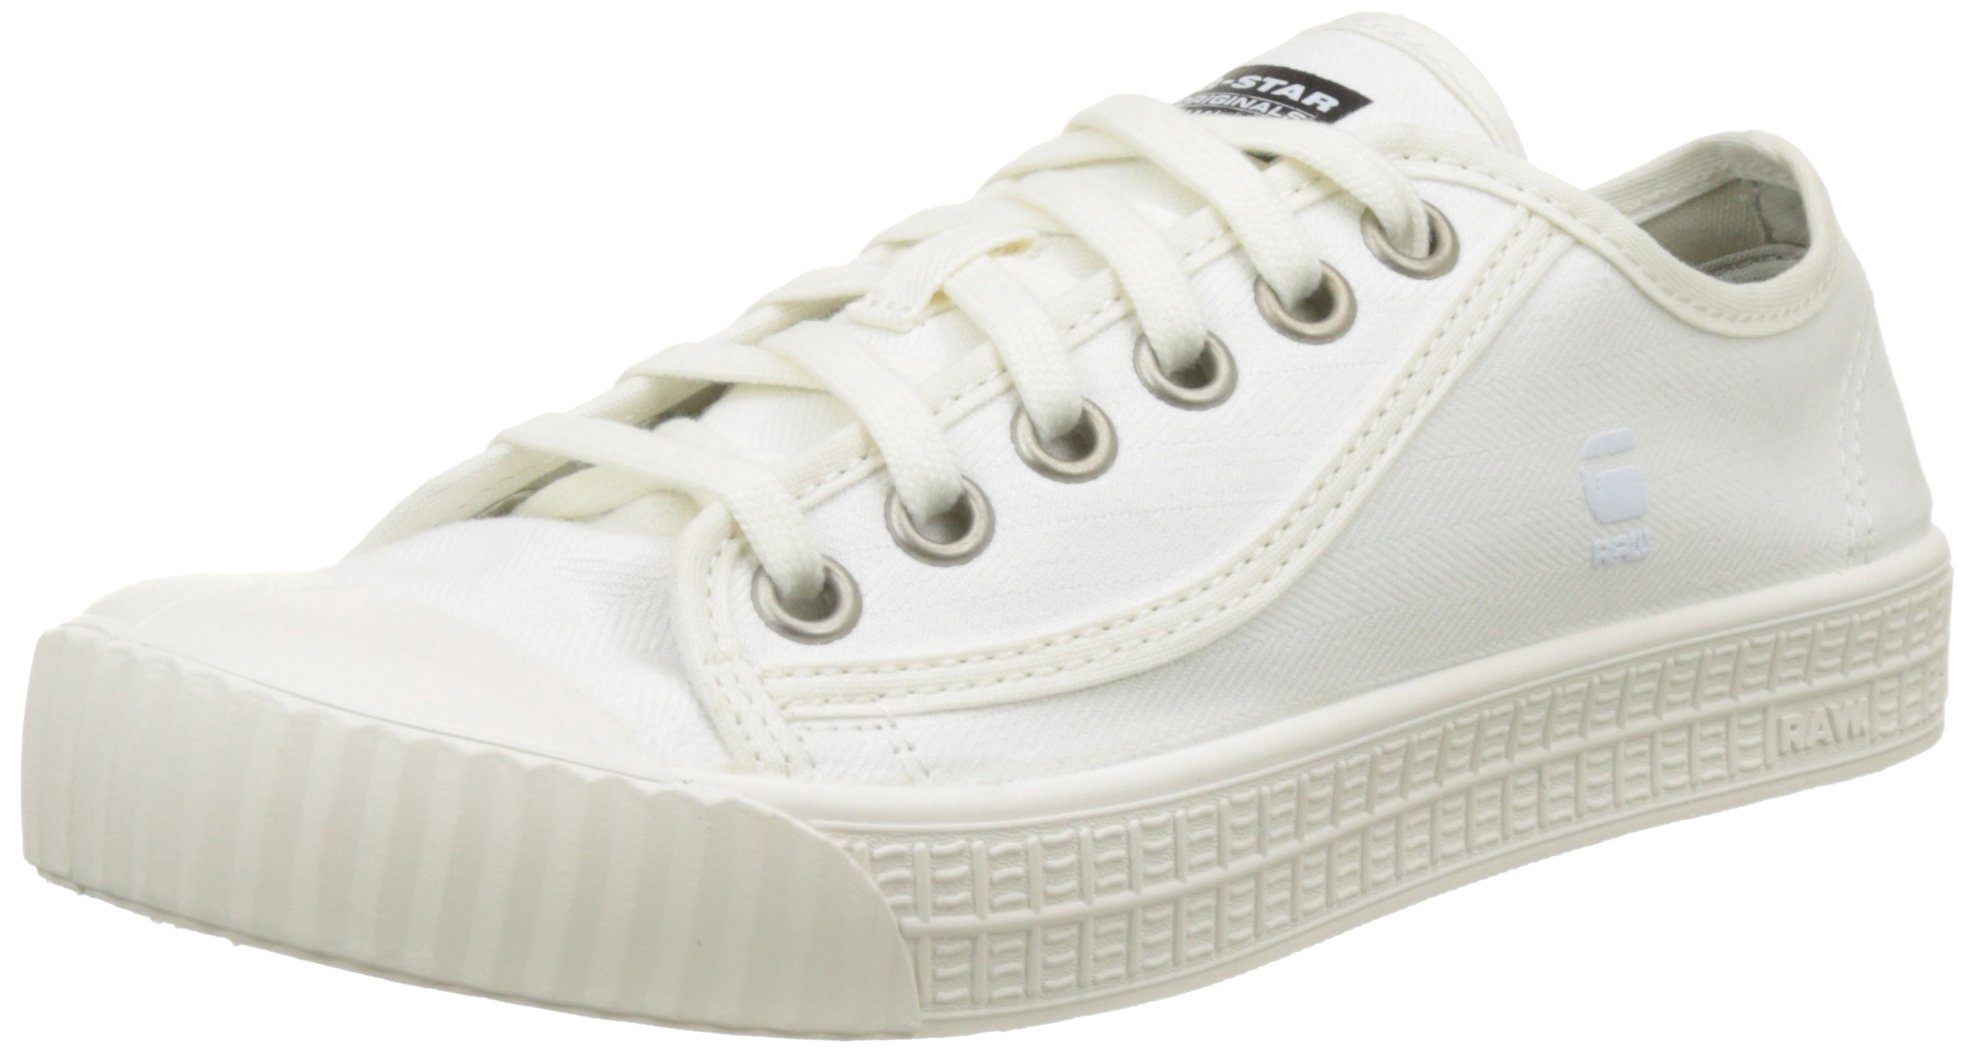 Rovulc Denim Eu G SneakersBasses FemmeBlancwhite Raw Low 11041 star SVpGLUzMq